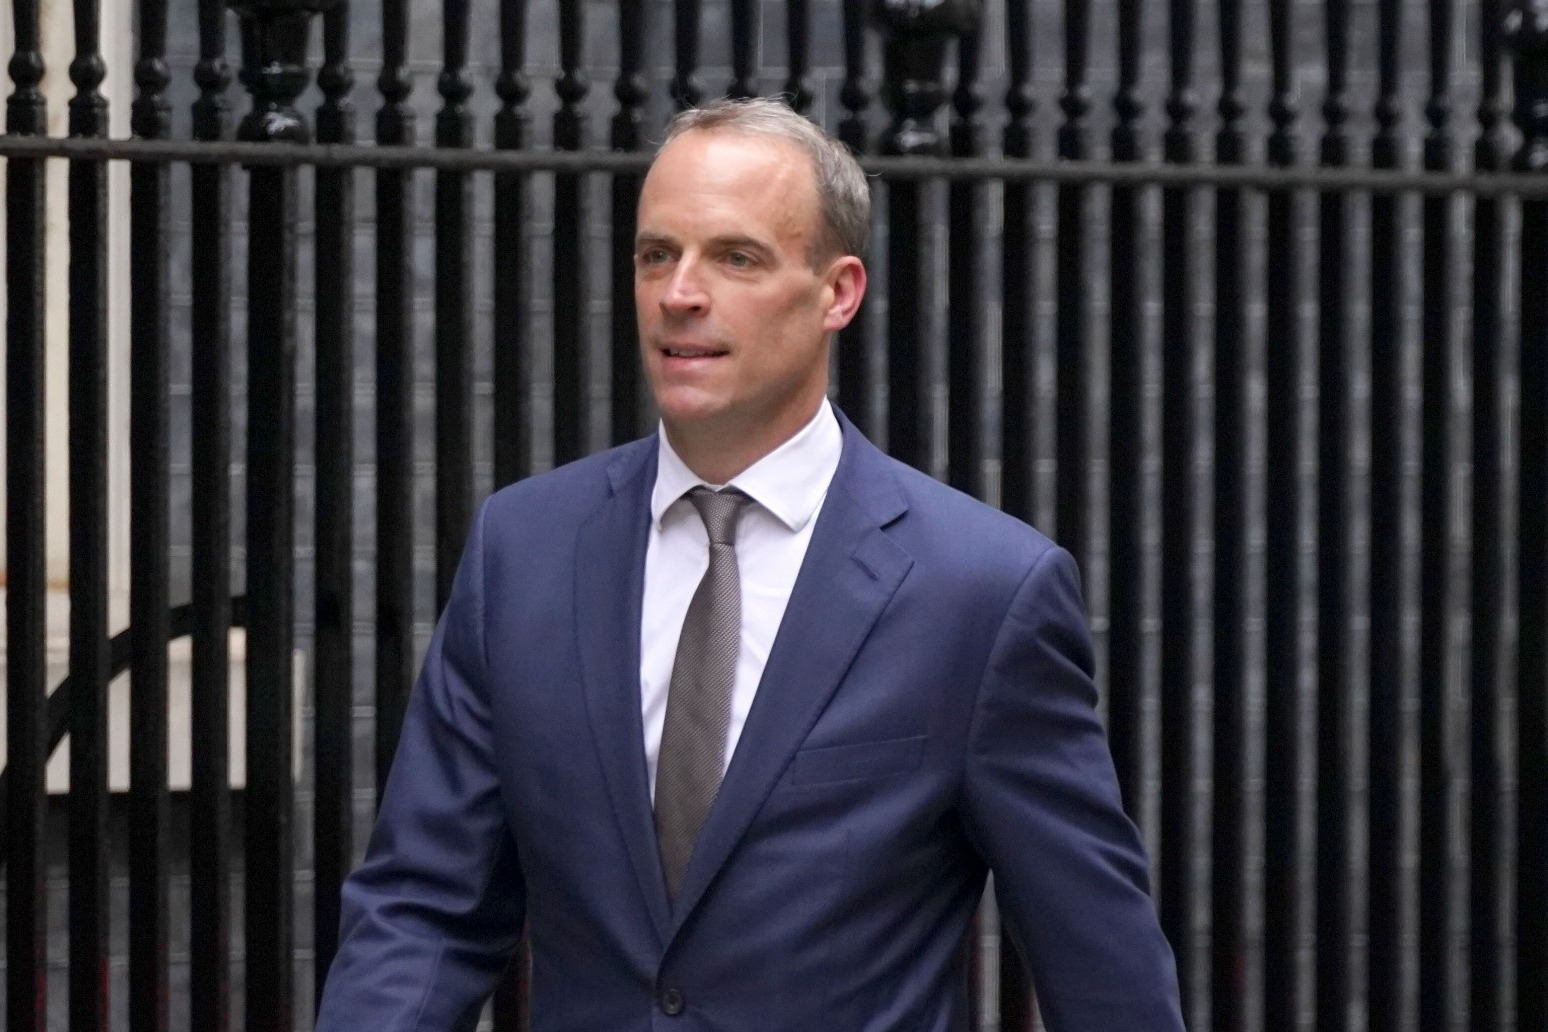 No 10: Raab still a key player in Government despite demotion